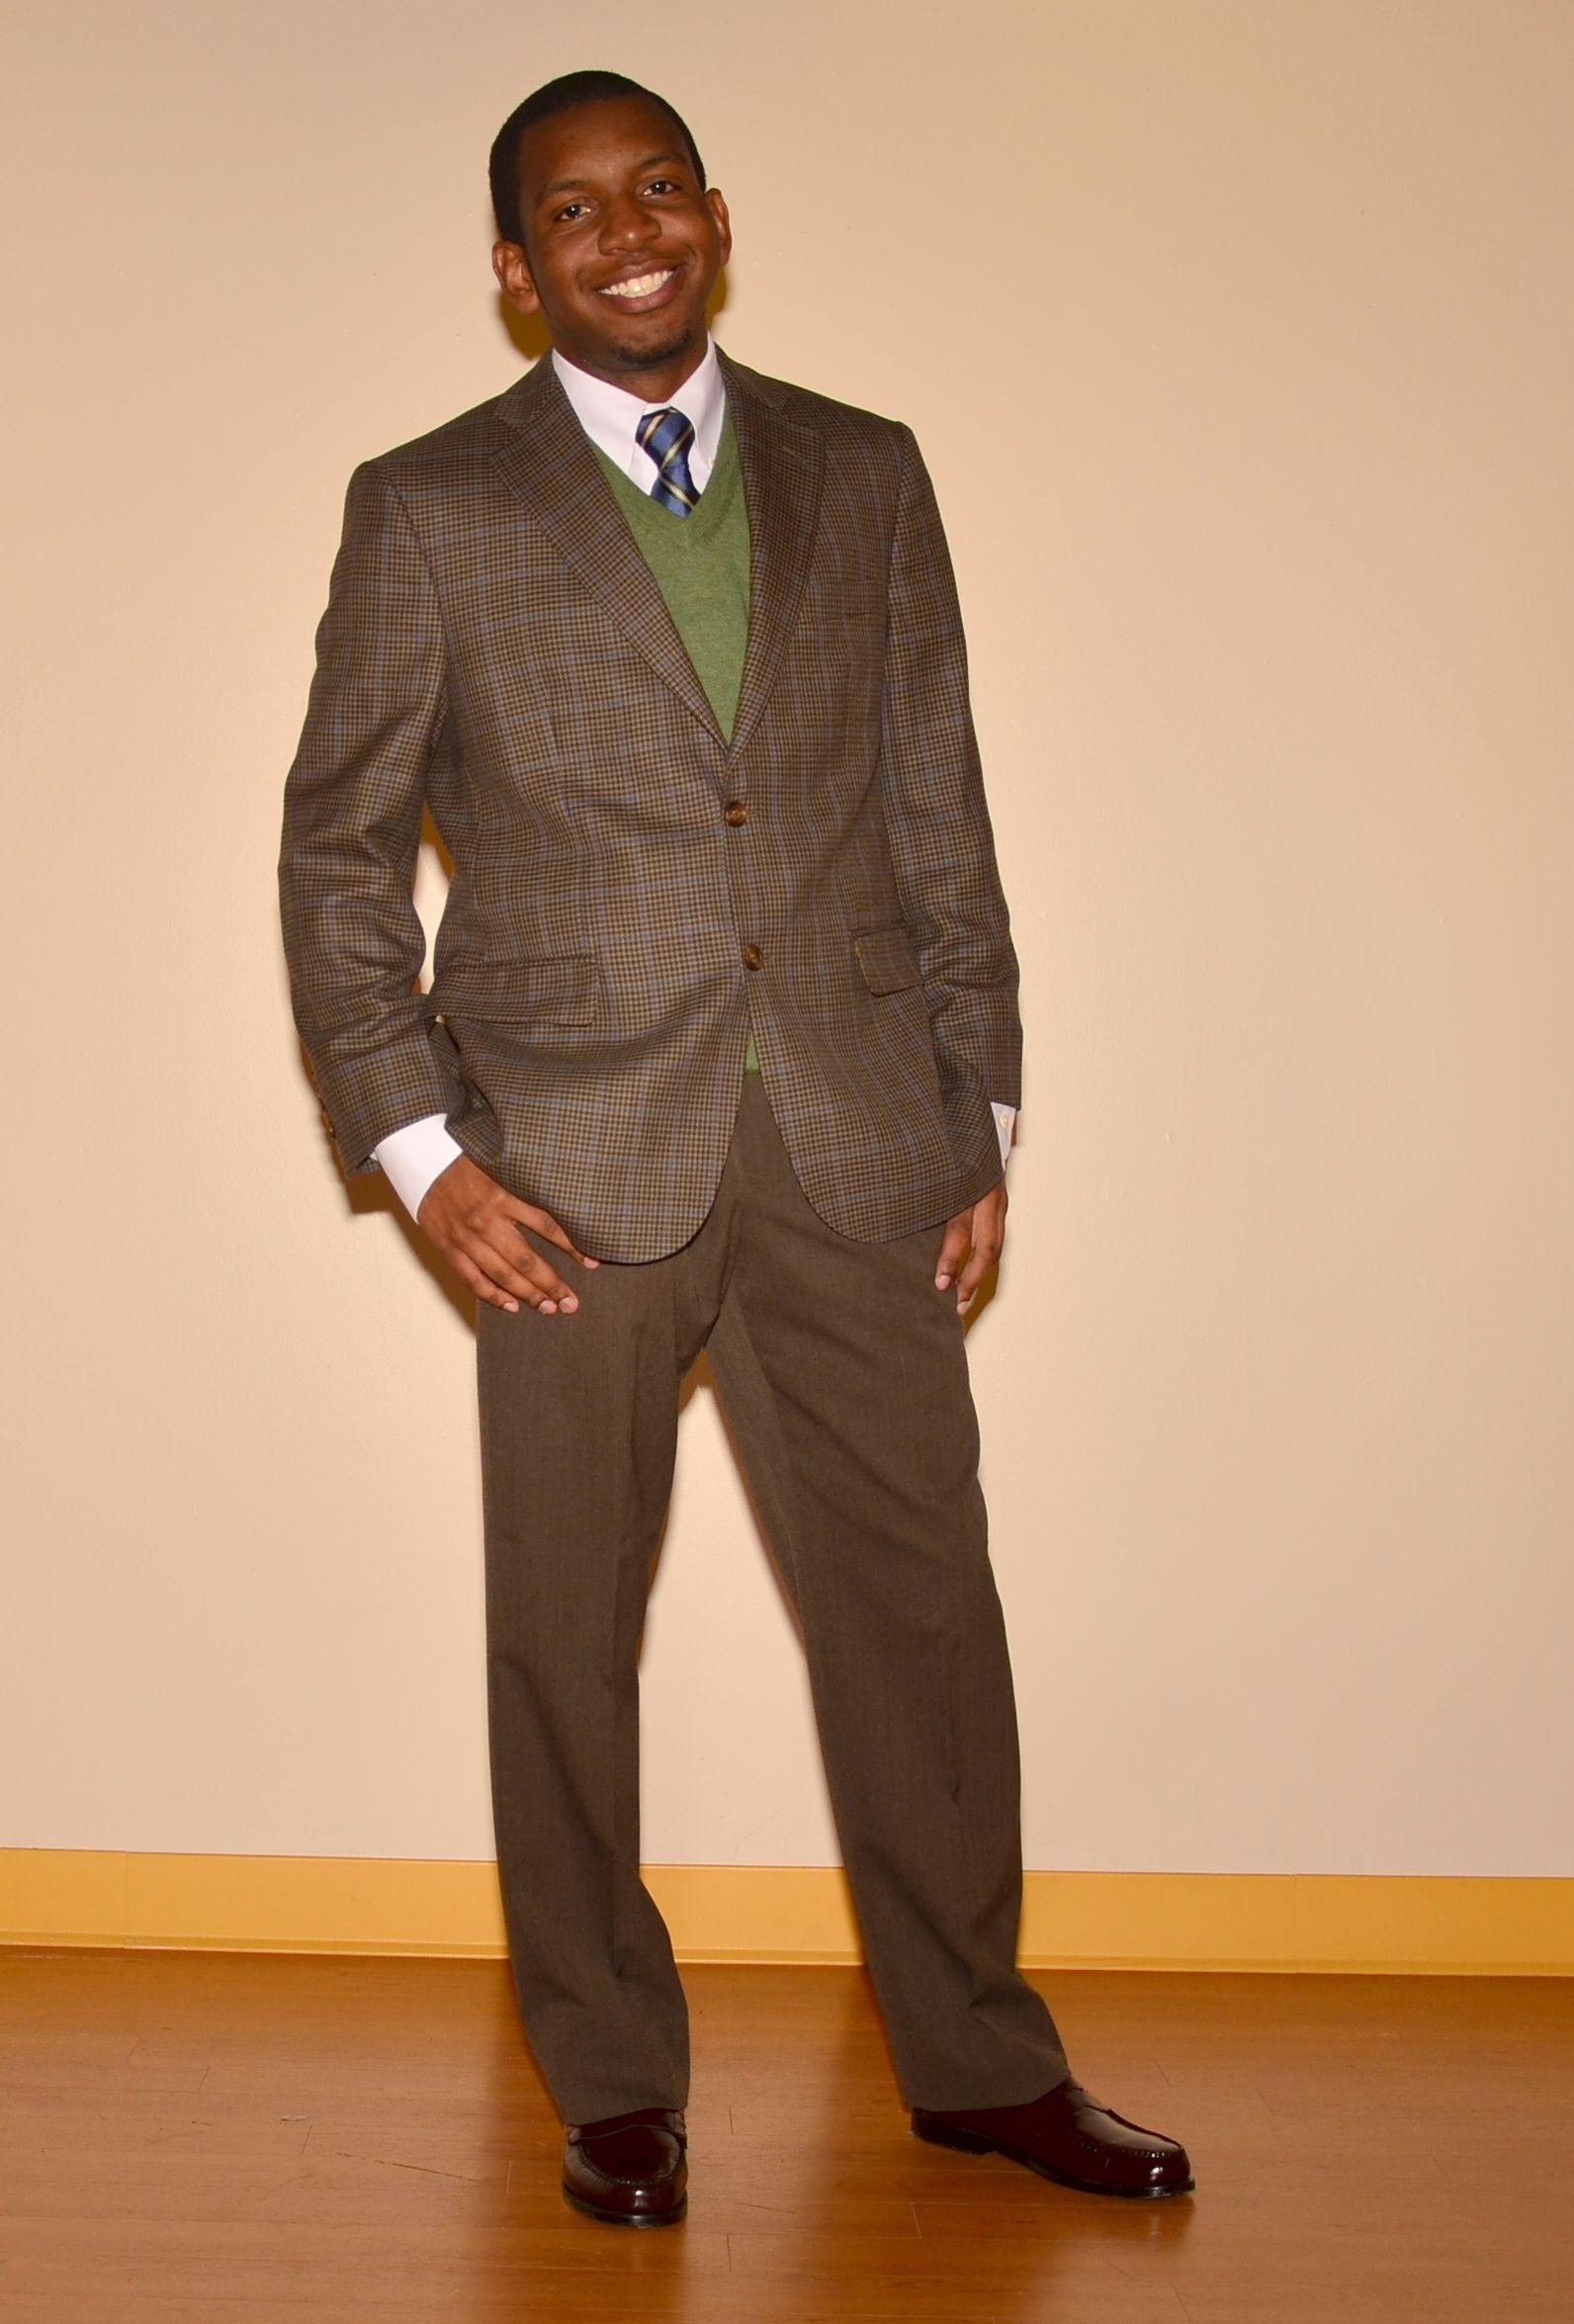 professional dress professional dress for men professional dress